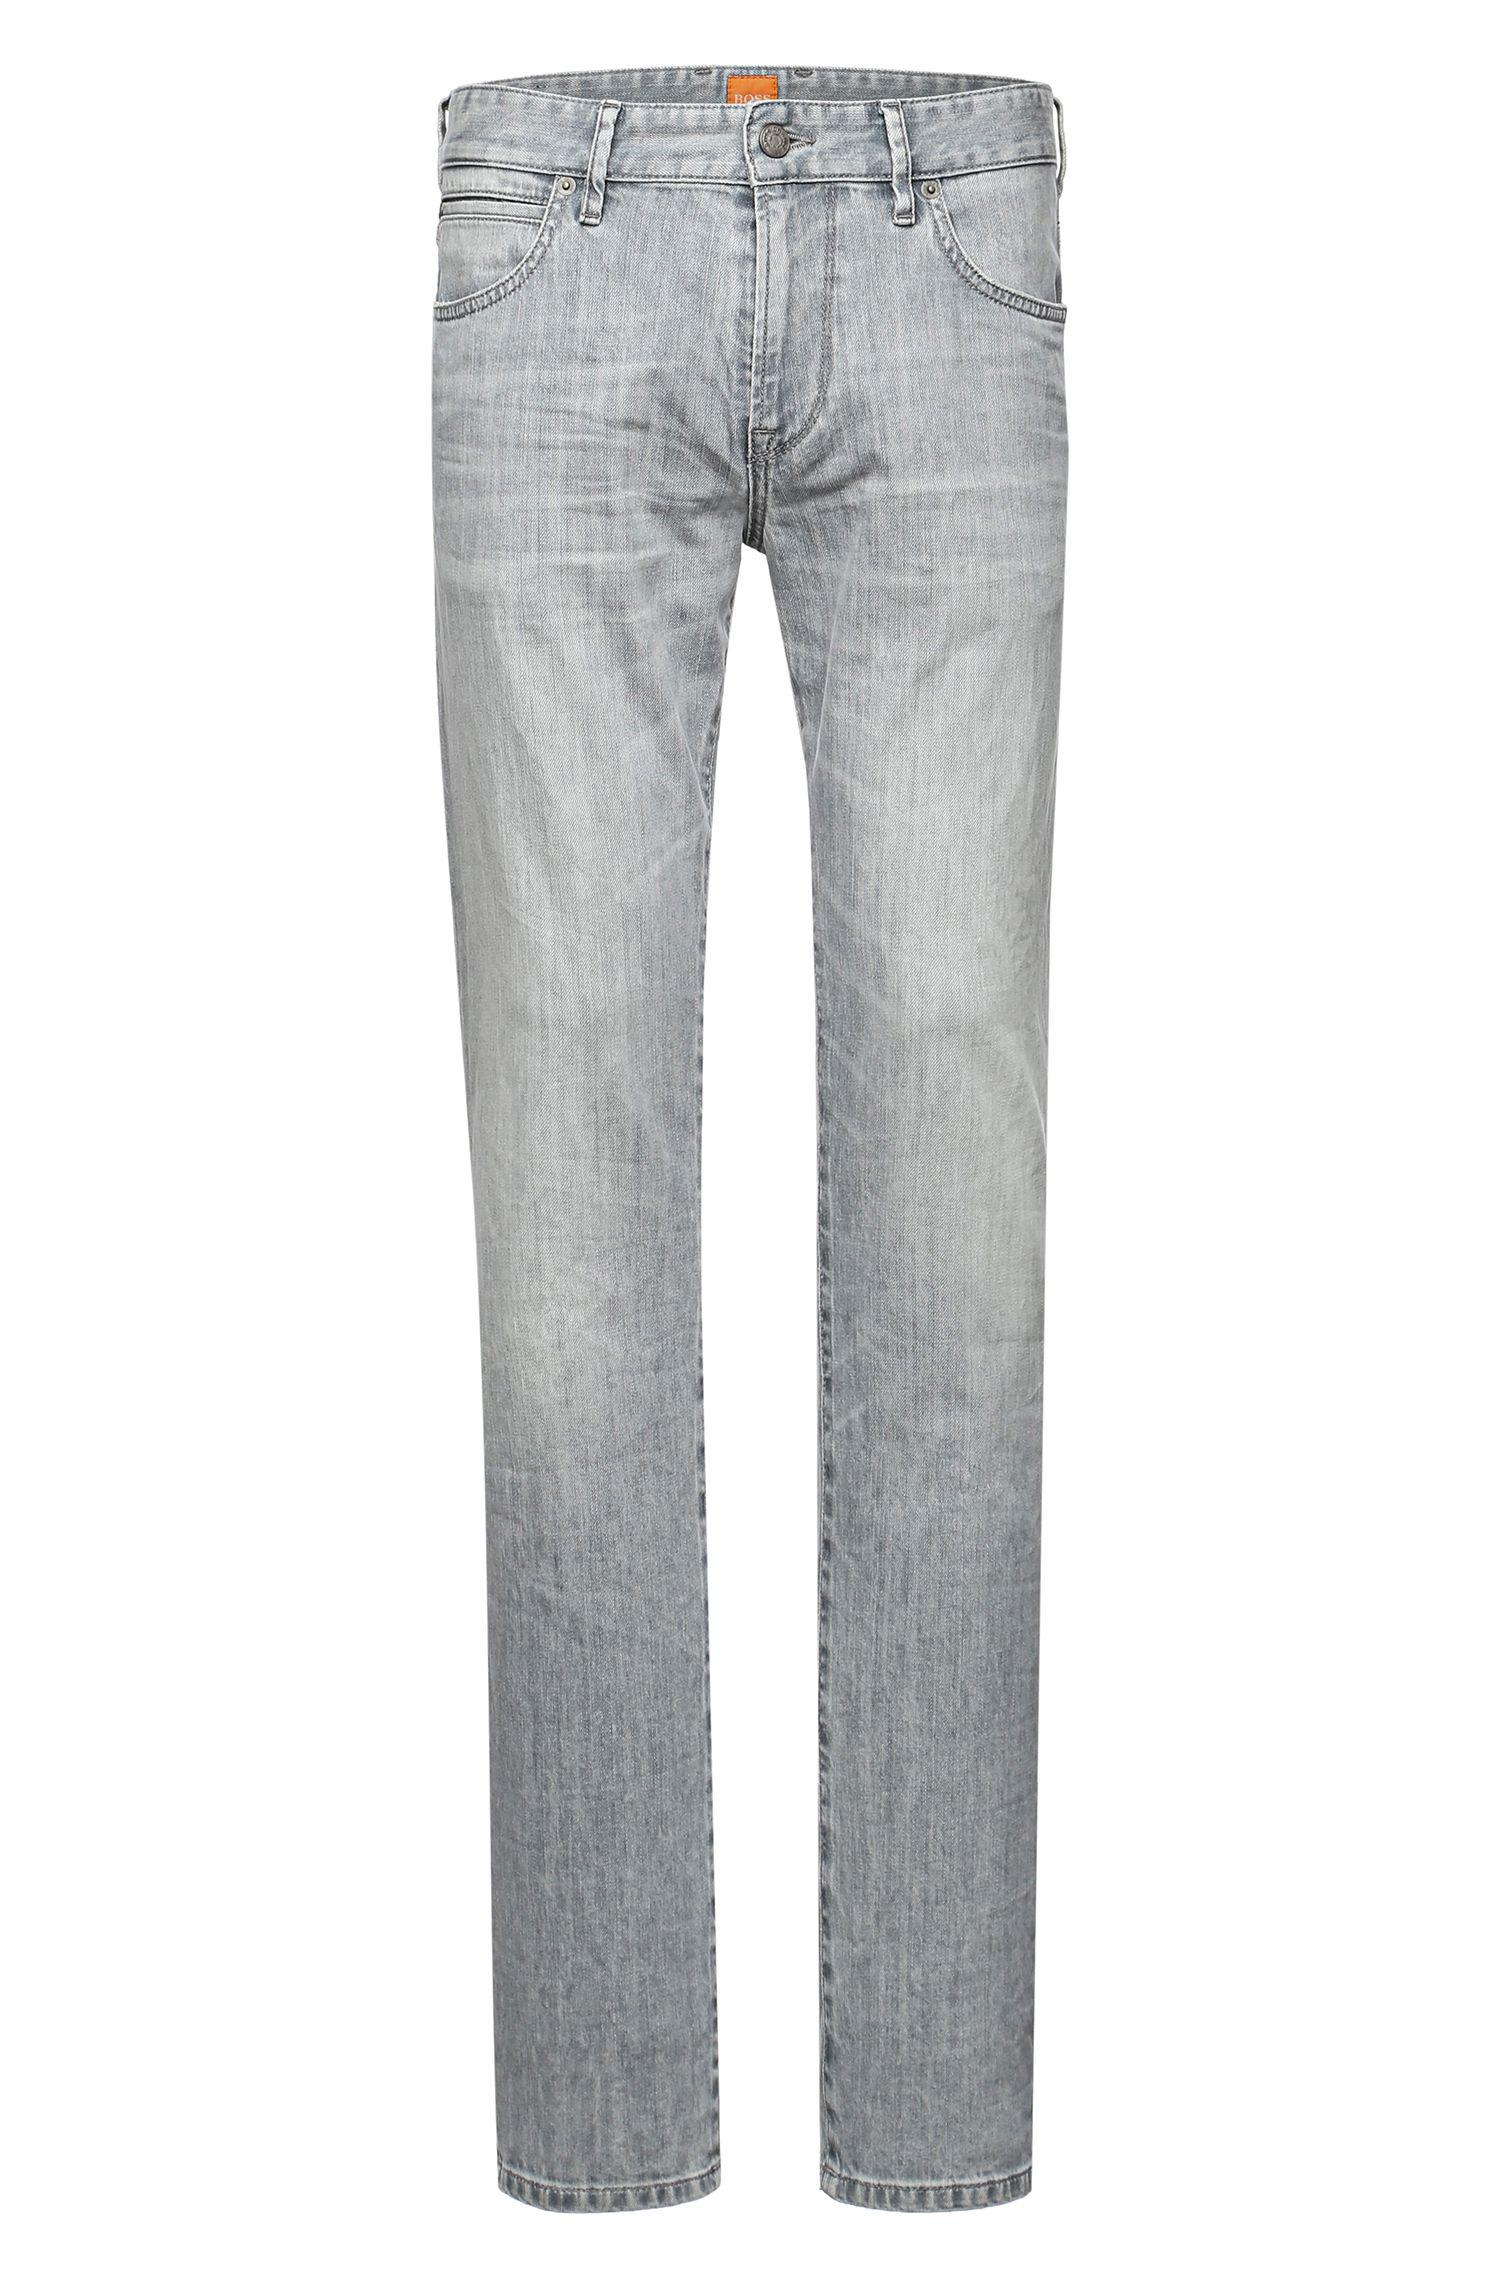 'Orange24 Barcelona' | Regular Fit, 9.5 oz Stretch Cotton Jeans